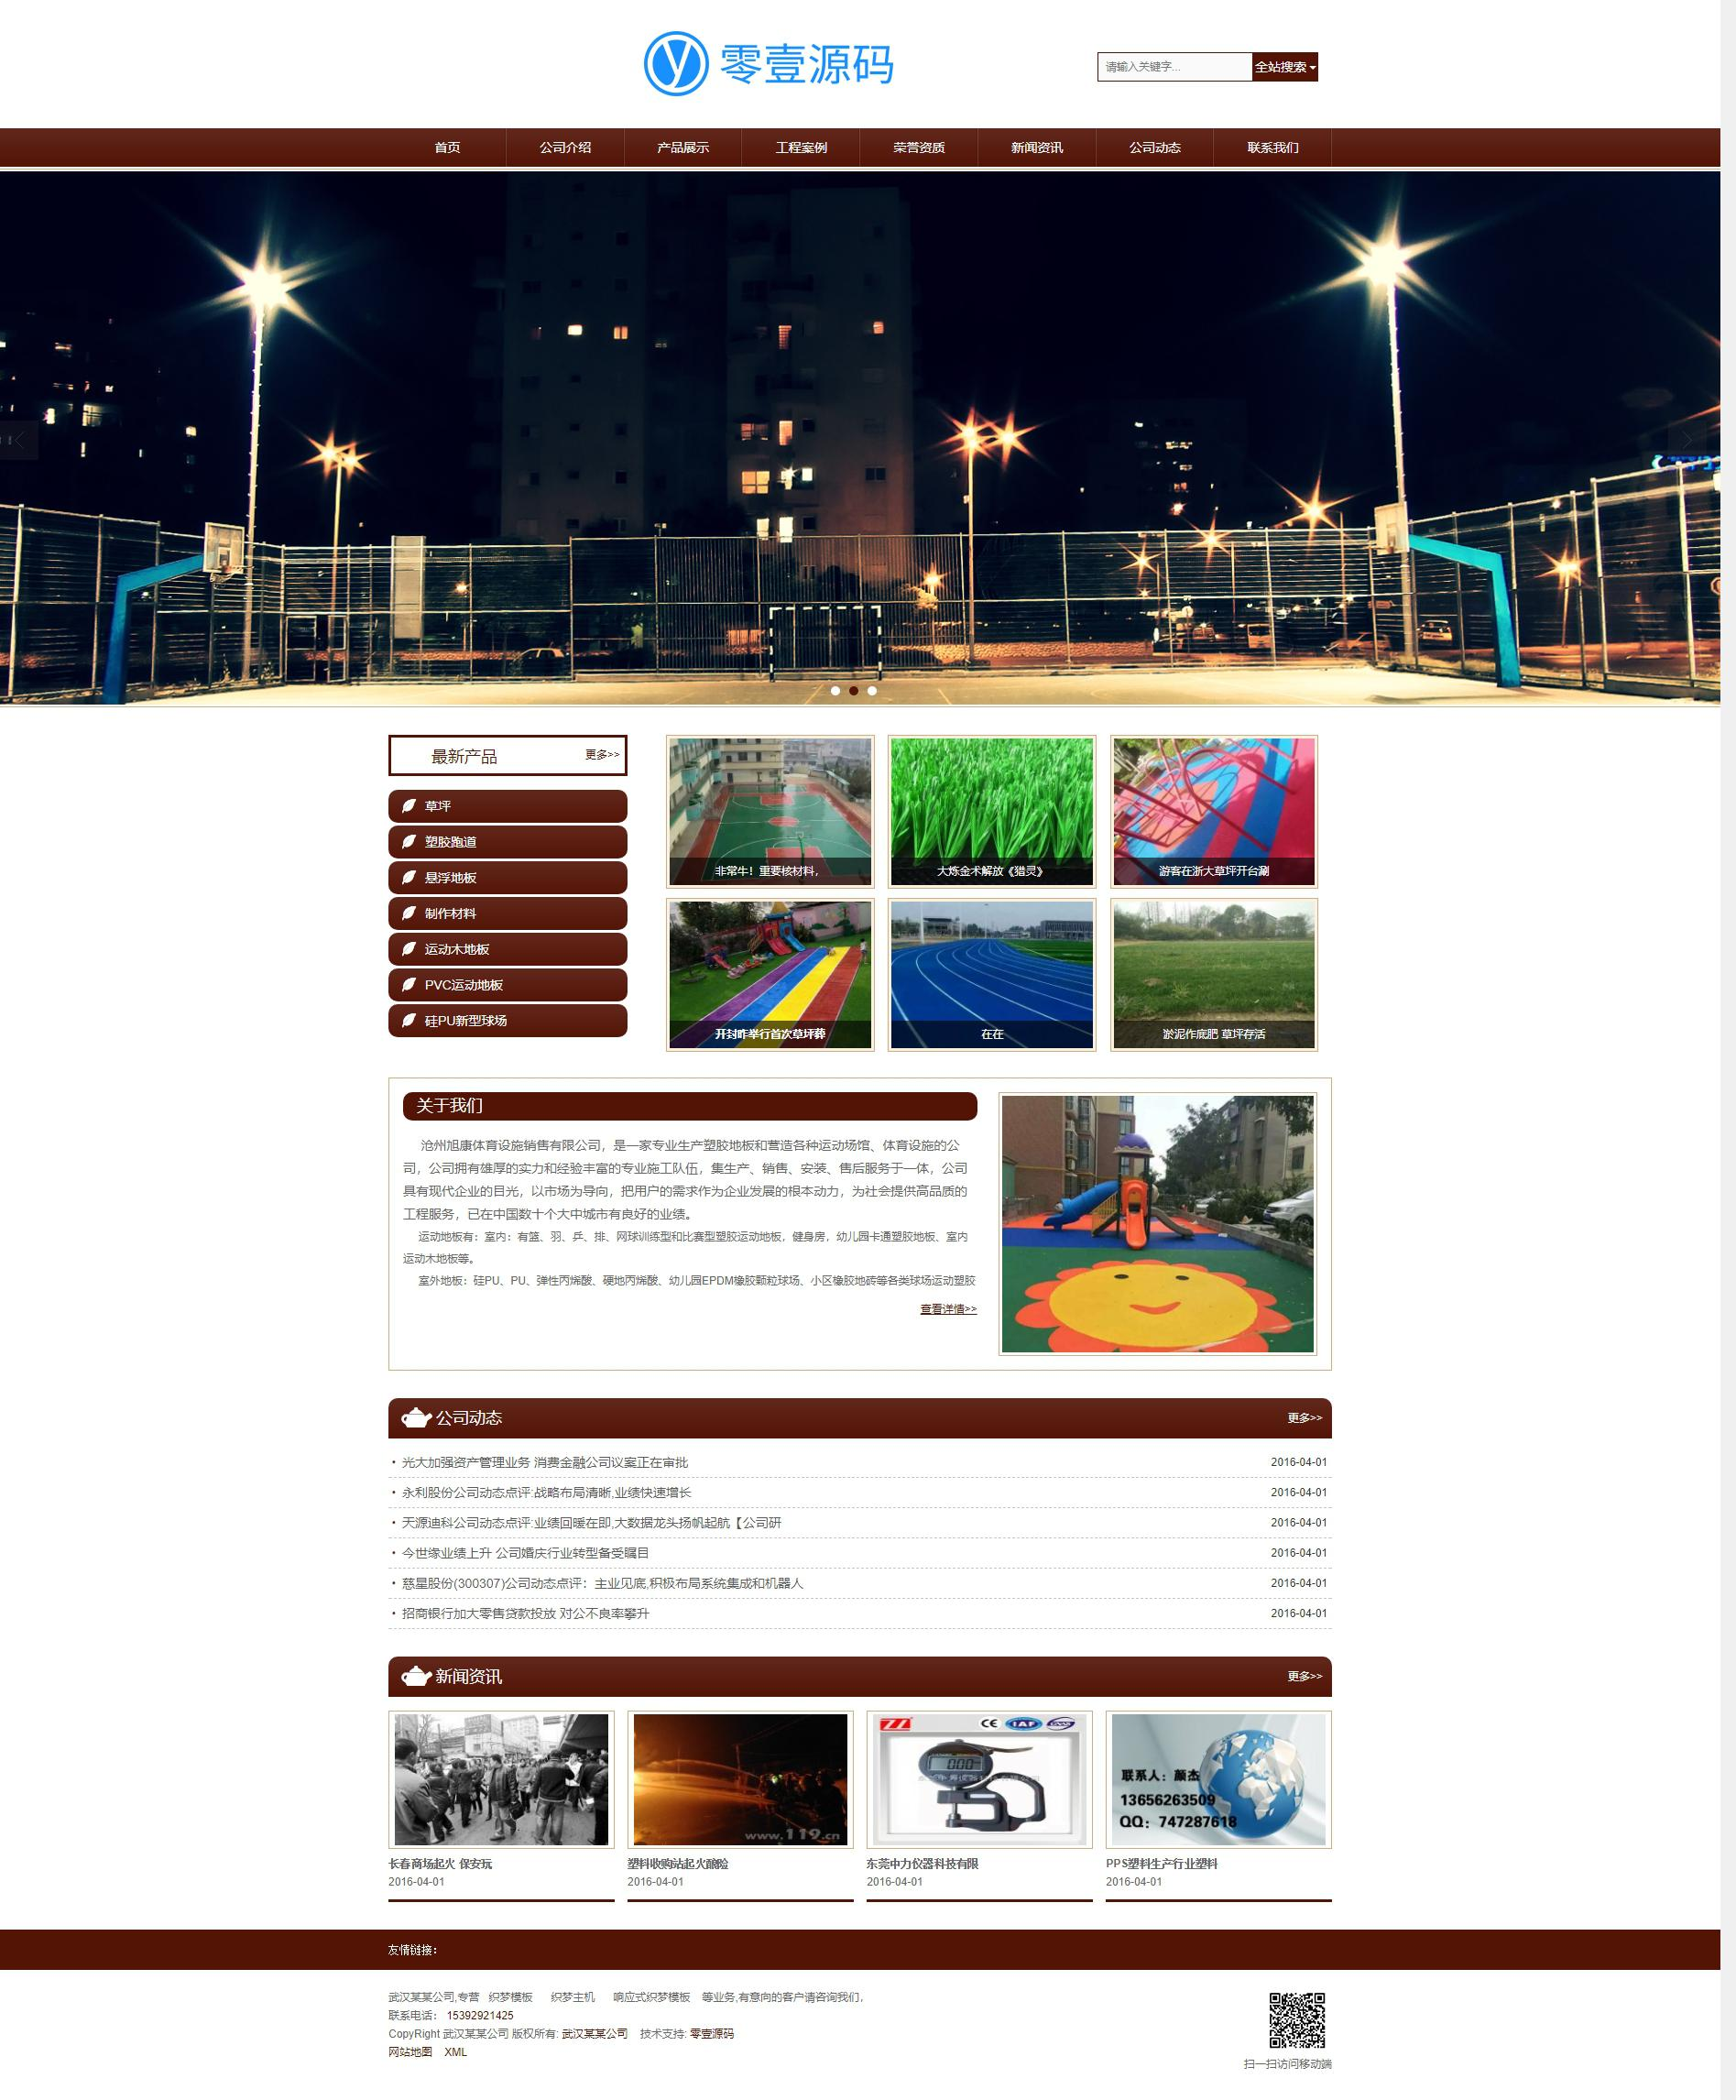 html5响应式自适应体育设施塑胶跑道制作材料织梦dedecms模板